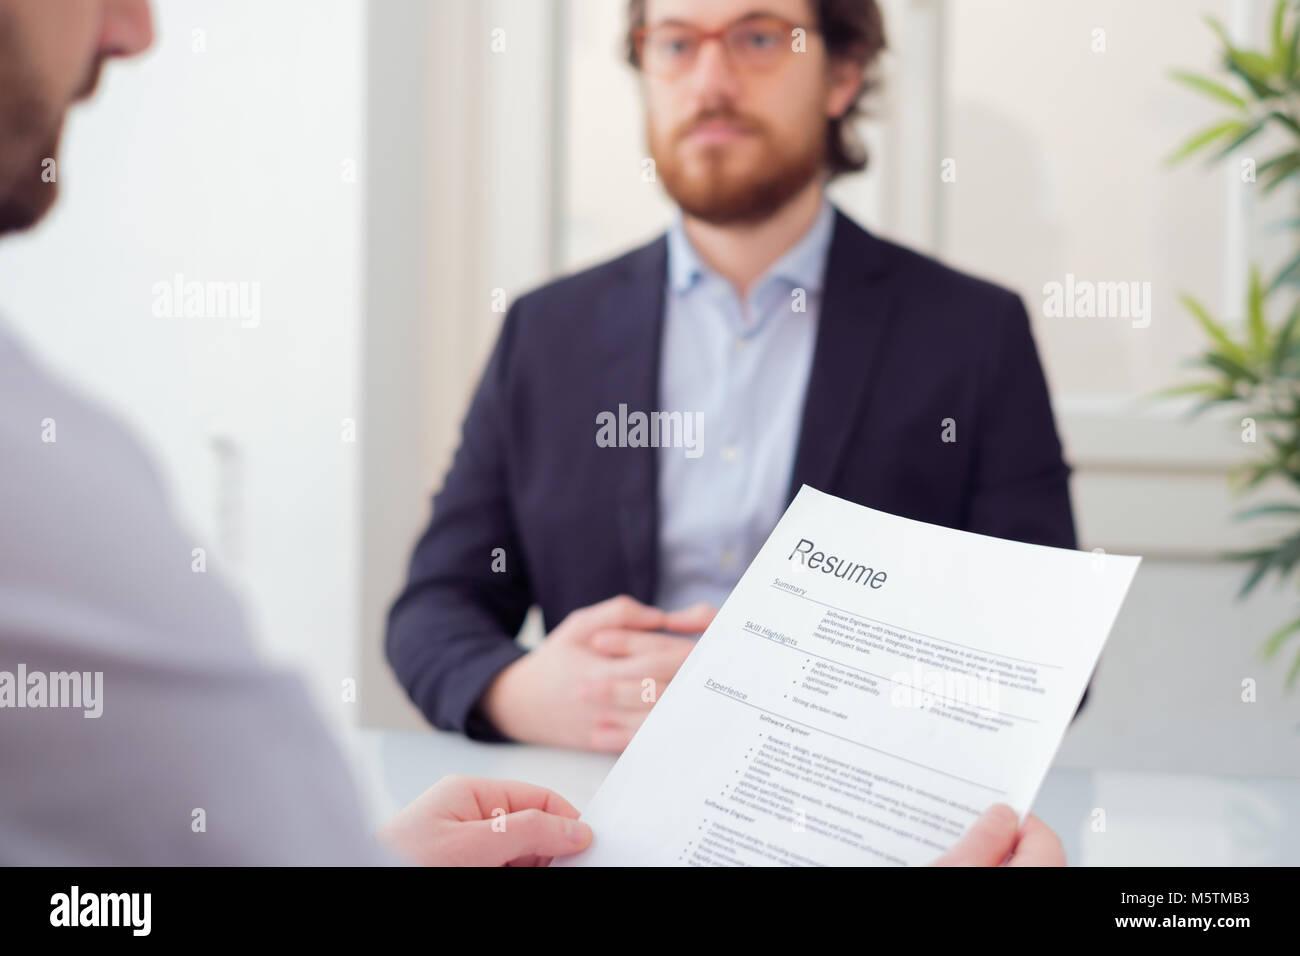 Recruiter reading curriculum during job interview - Stock Image